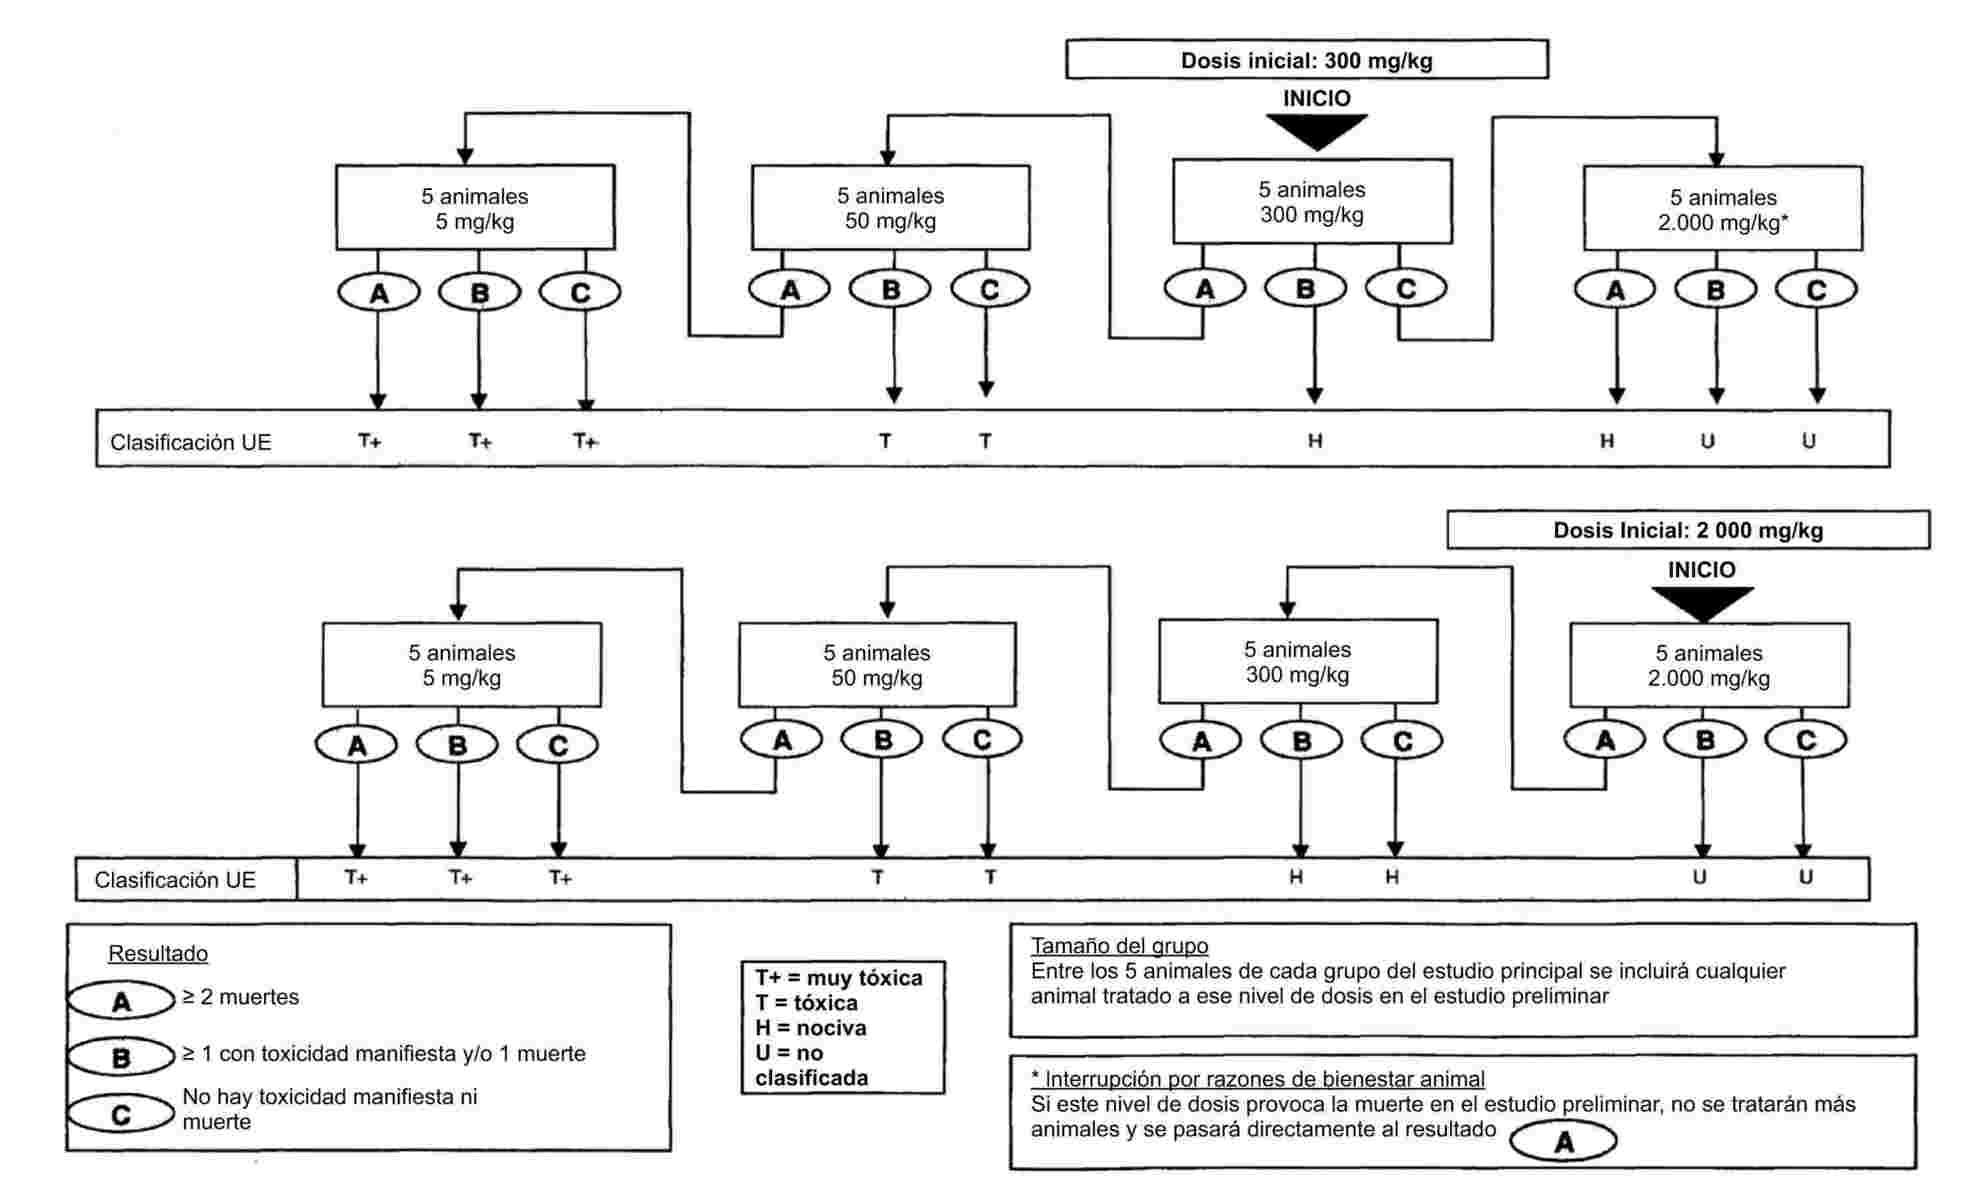 Imagen: https://eur-lex.europa.eu/resource.html?uri=uriserv:OJ.L_.2008.142.01.0001.01.SPA.xhtml.L_2008142ES.01015701.tif.jpg